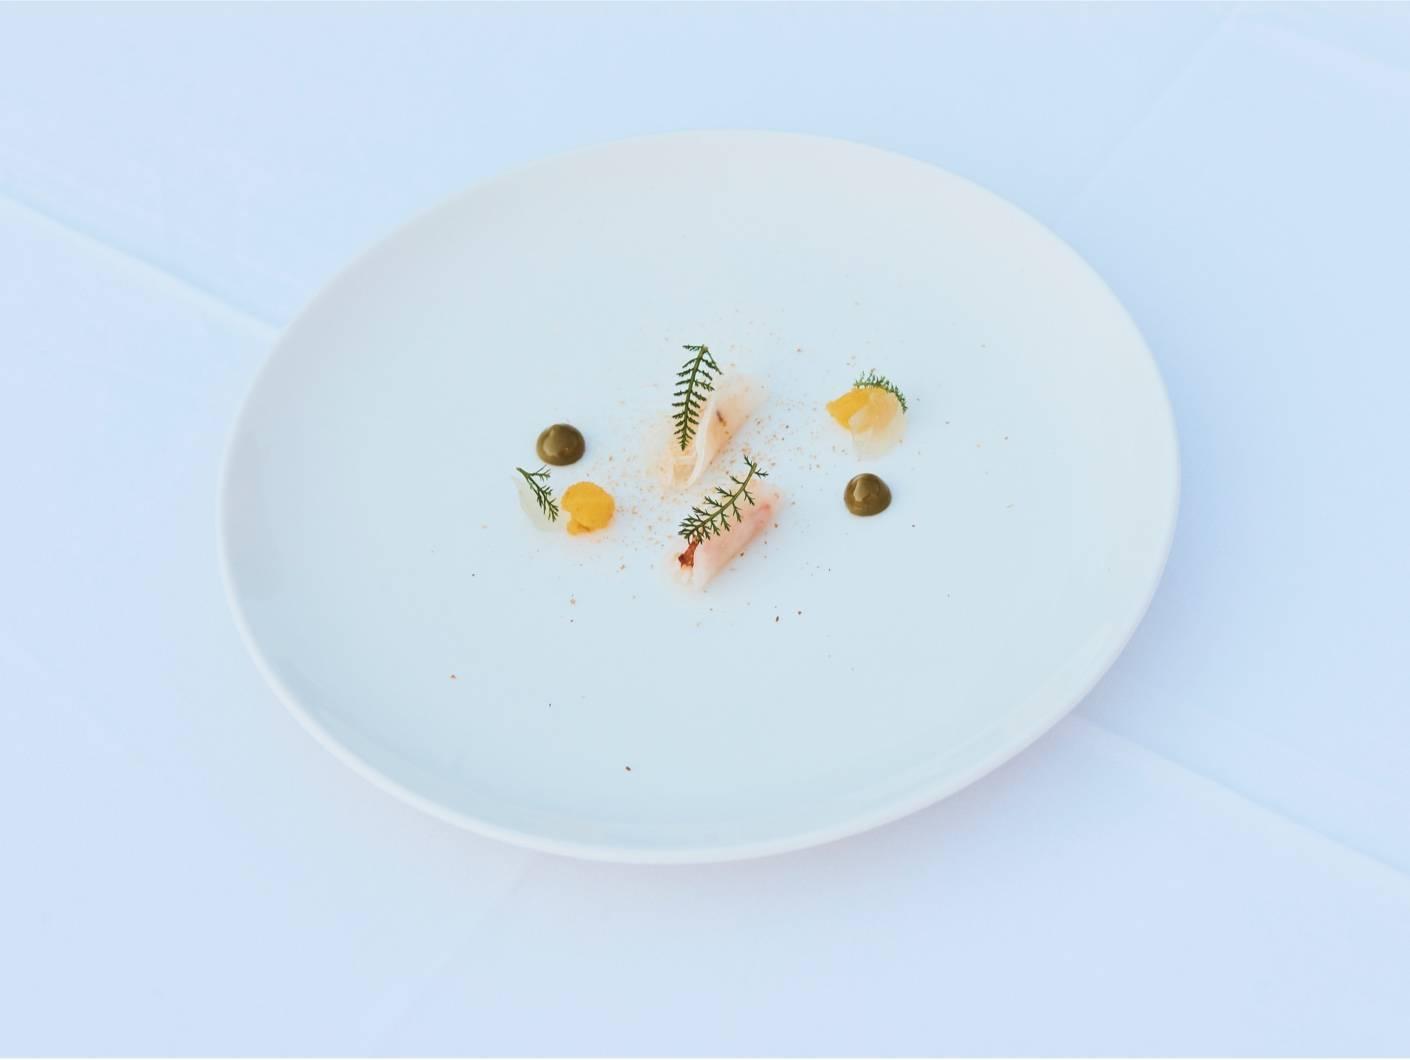 Slovenia restaurants get first Michelin stars